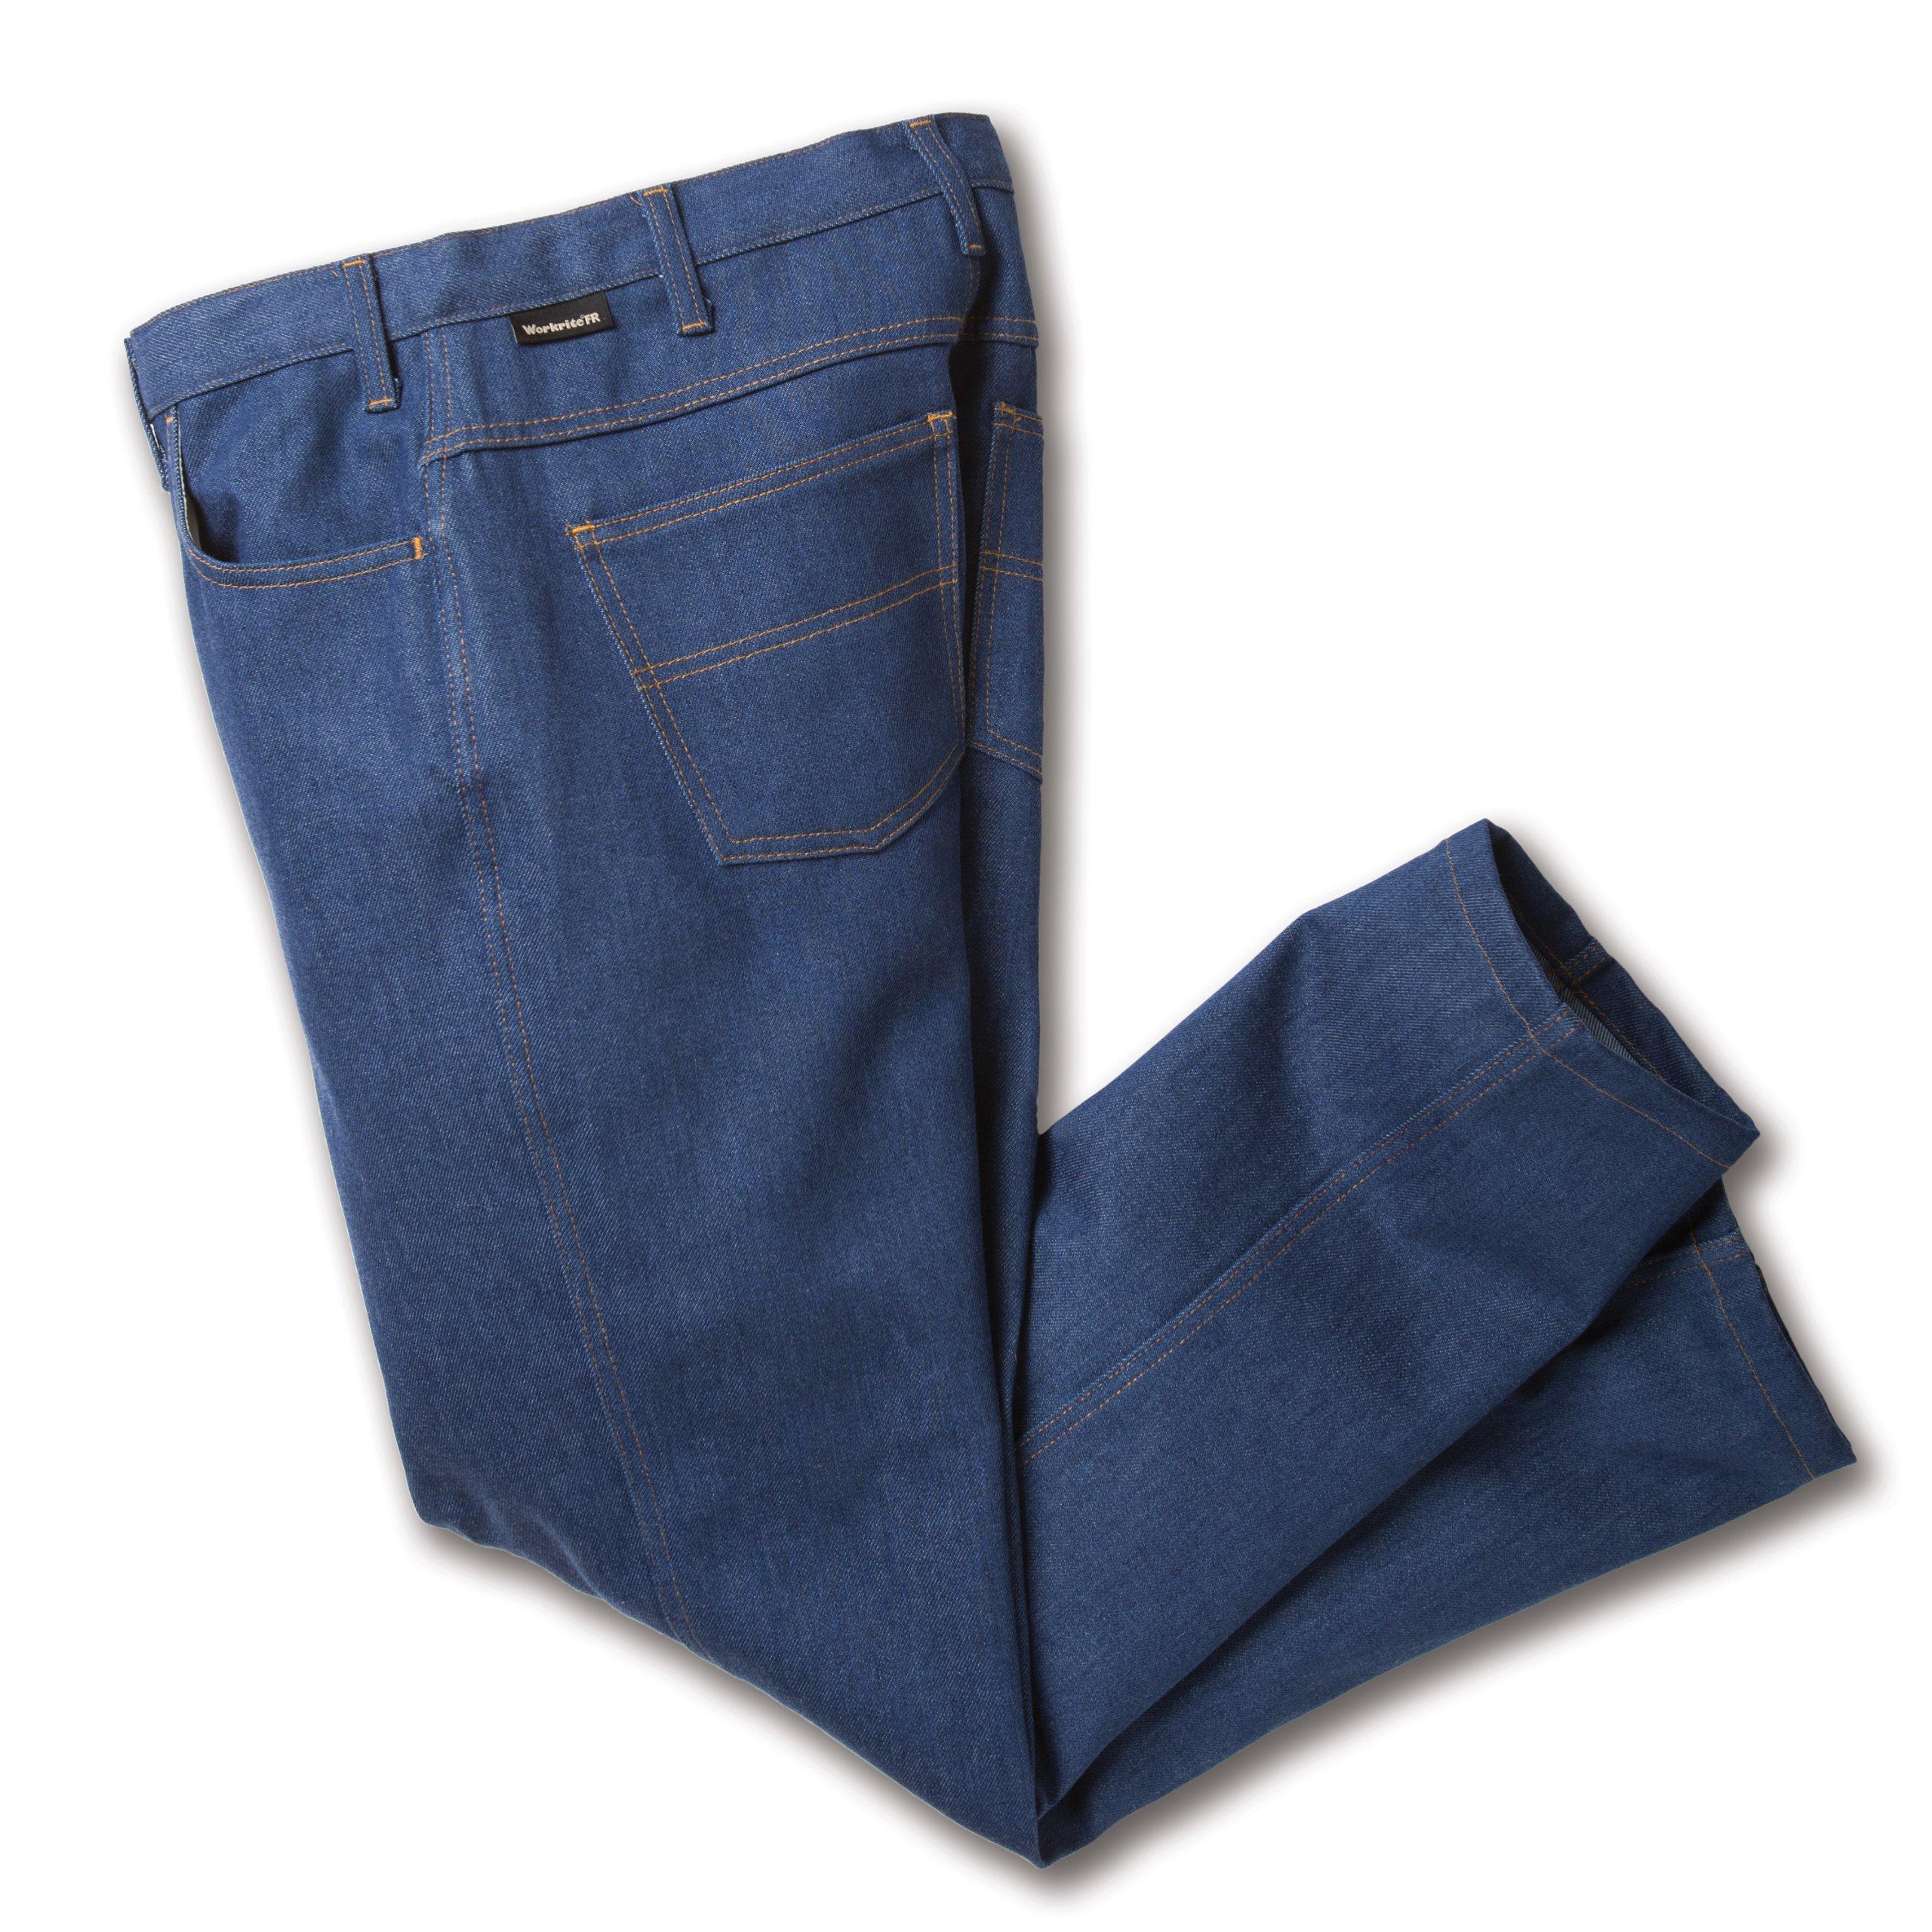 Workrite 418ID14DN46-34 Flame Resistant 14 oz Indura Jean-Cut Pant, 46 Waist Size, 34 Inseam, Denim